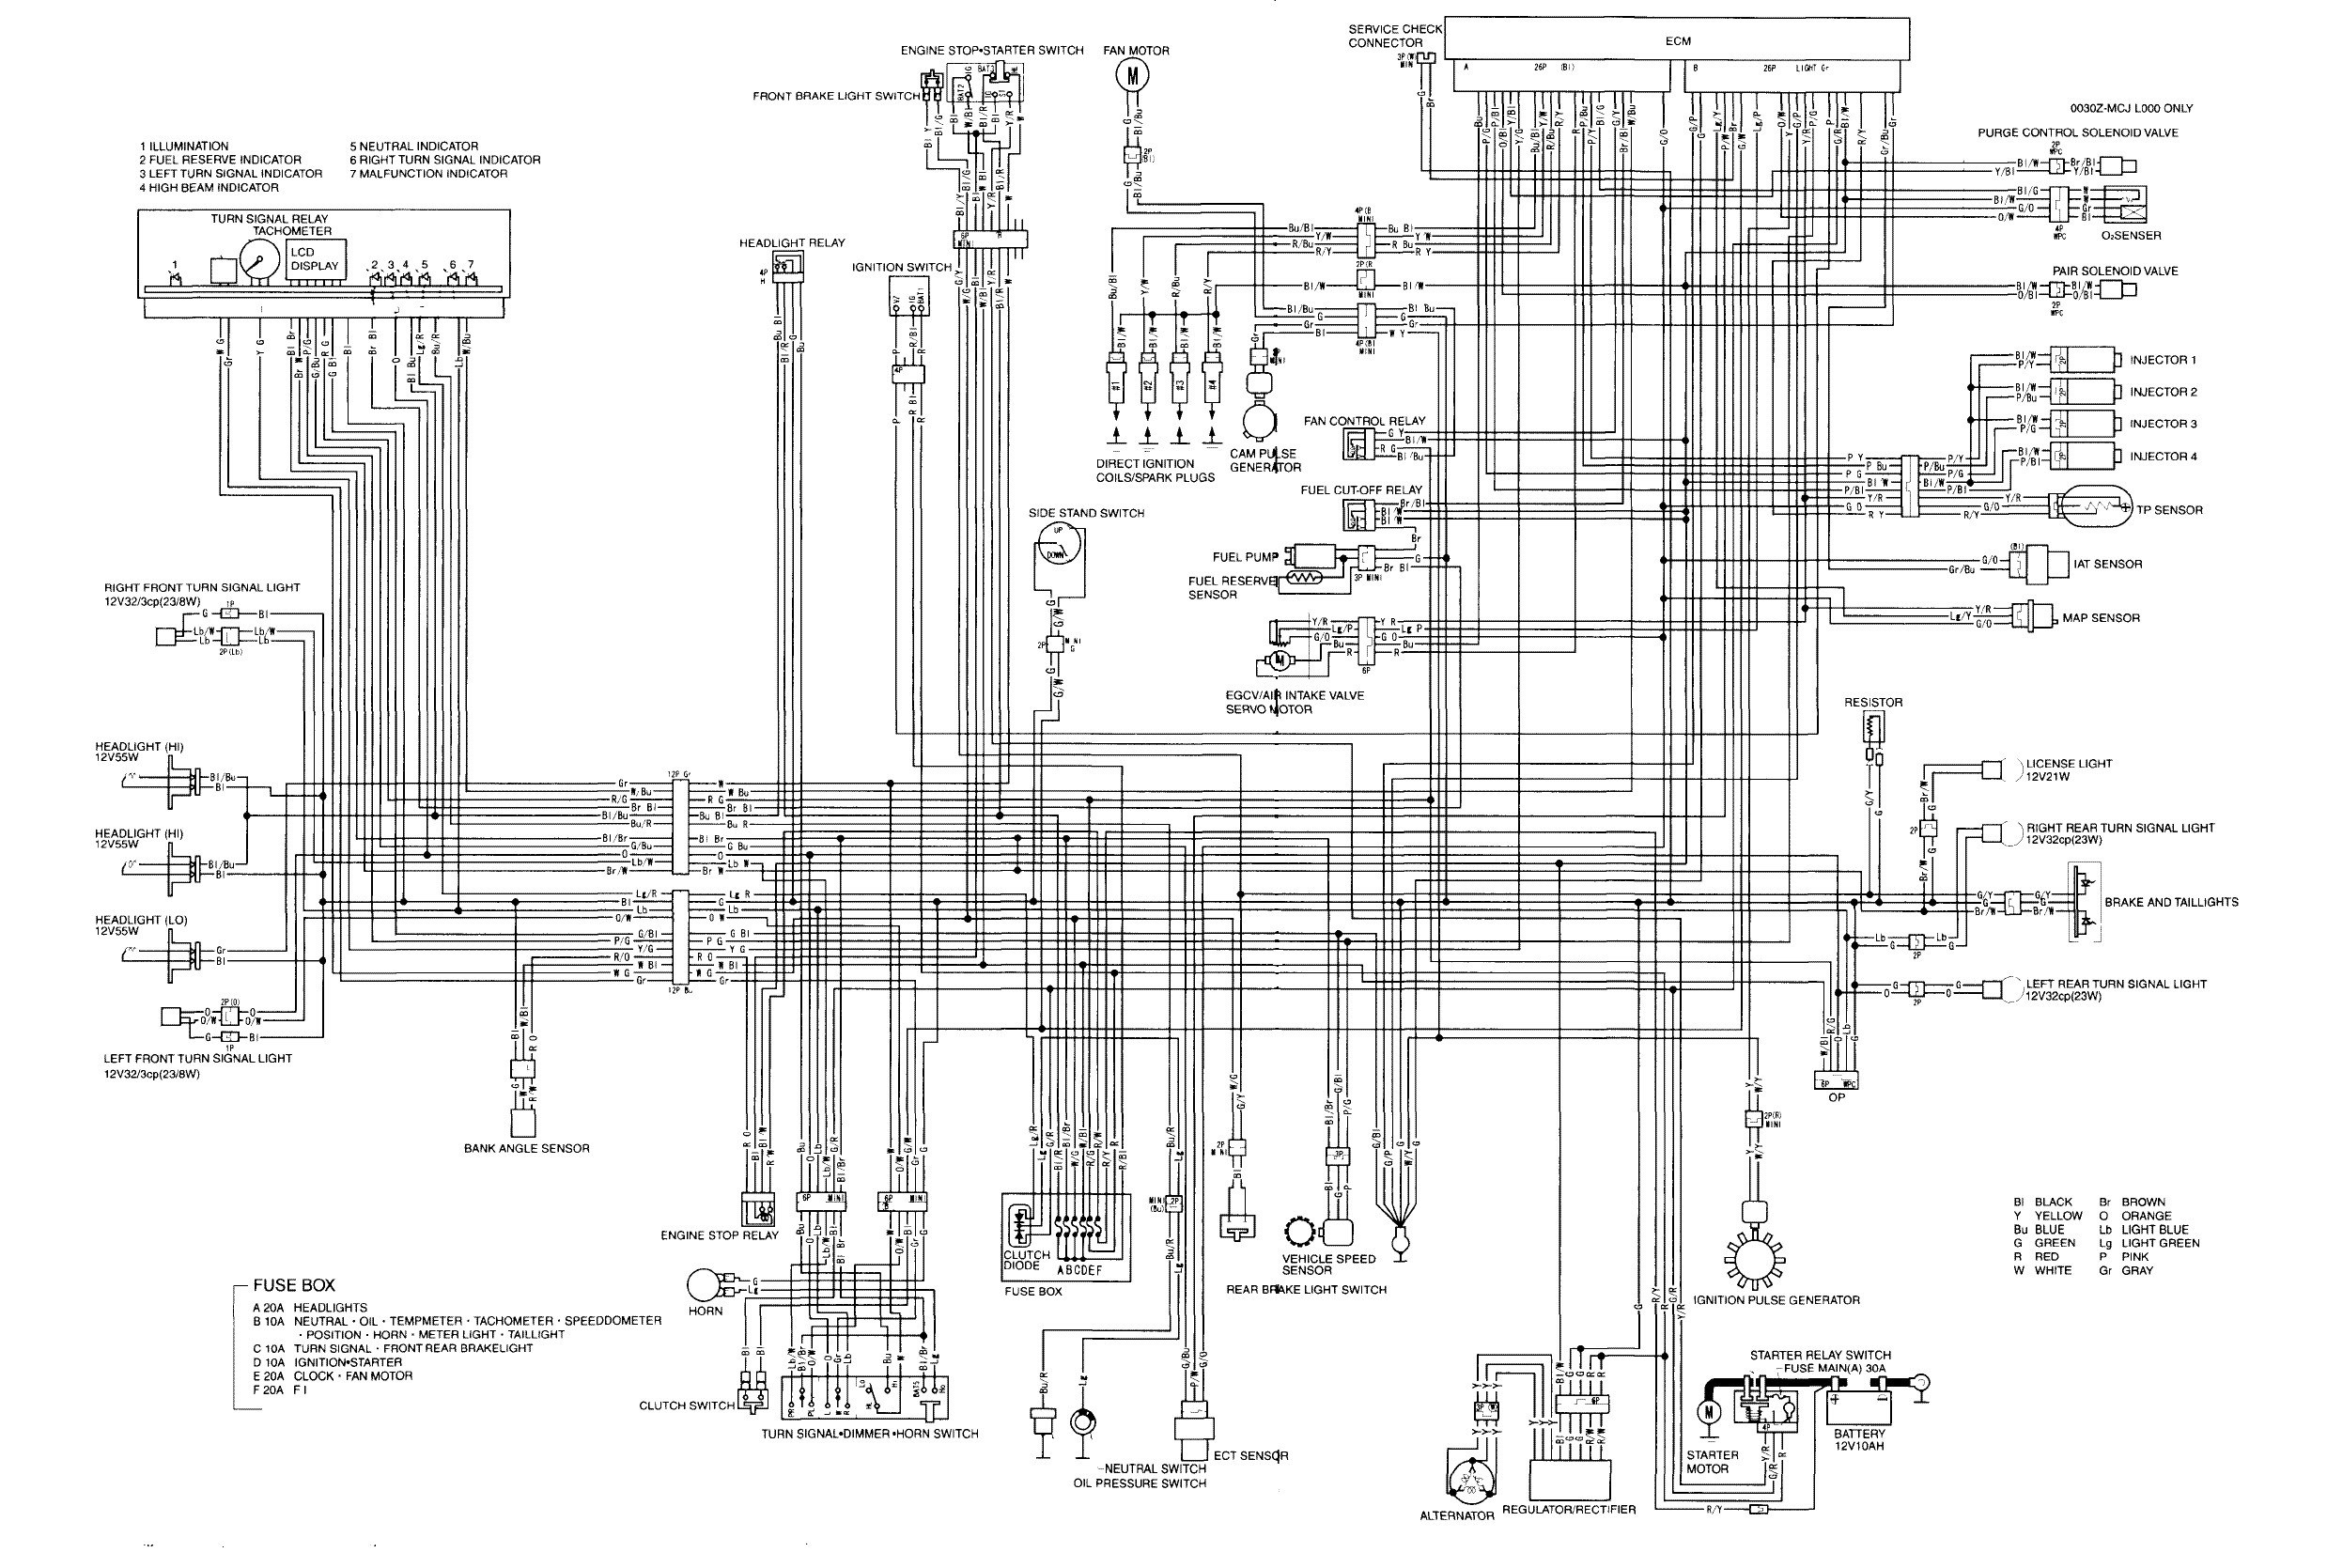 [SCHEMATICS_4US]  Honda 600rr Wiring Diagram - Subaru Outback 2002 Wiring Diagram for Wiring  Diagram Schematics | Honda 600rr Wiring Diagram |  | Wiring Diagram Schematics